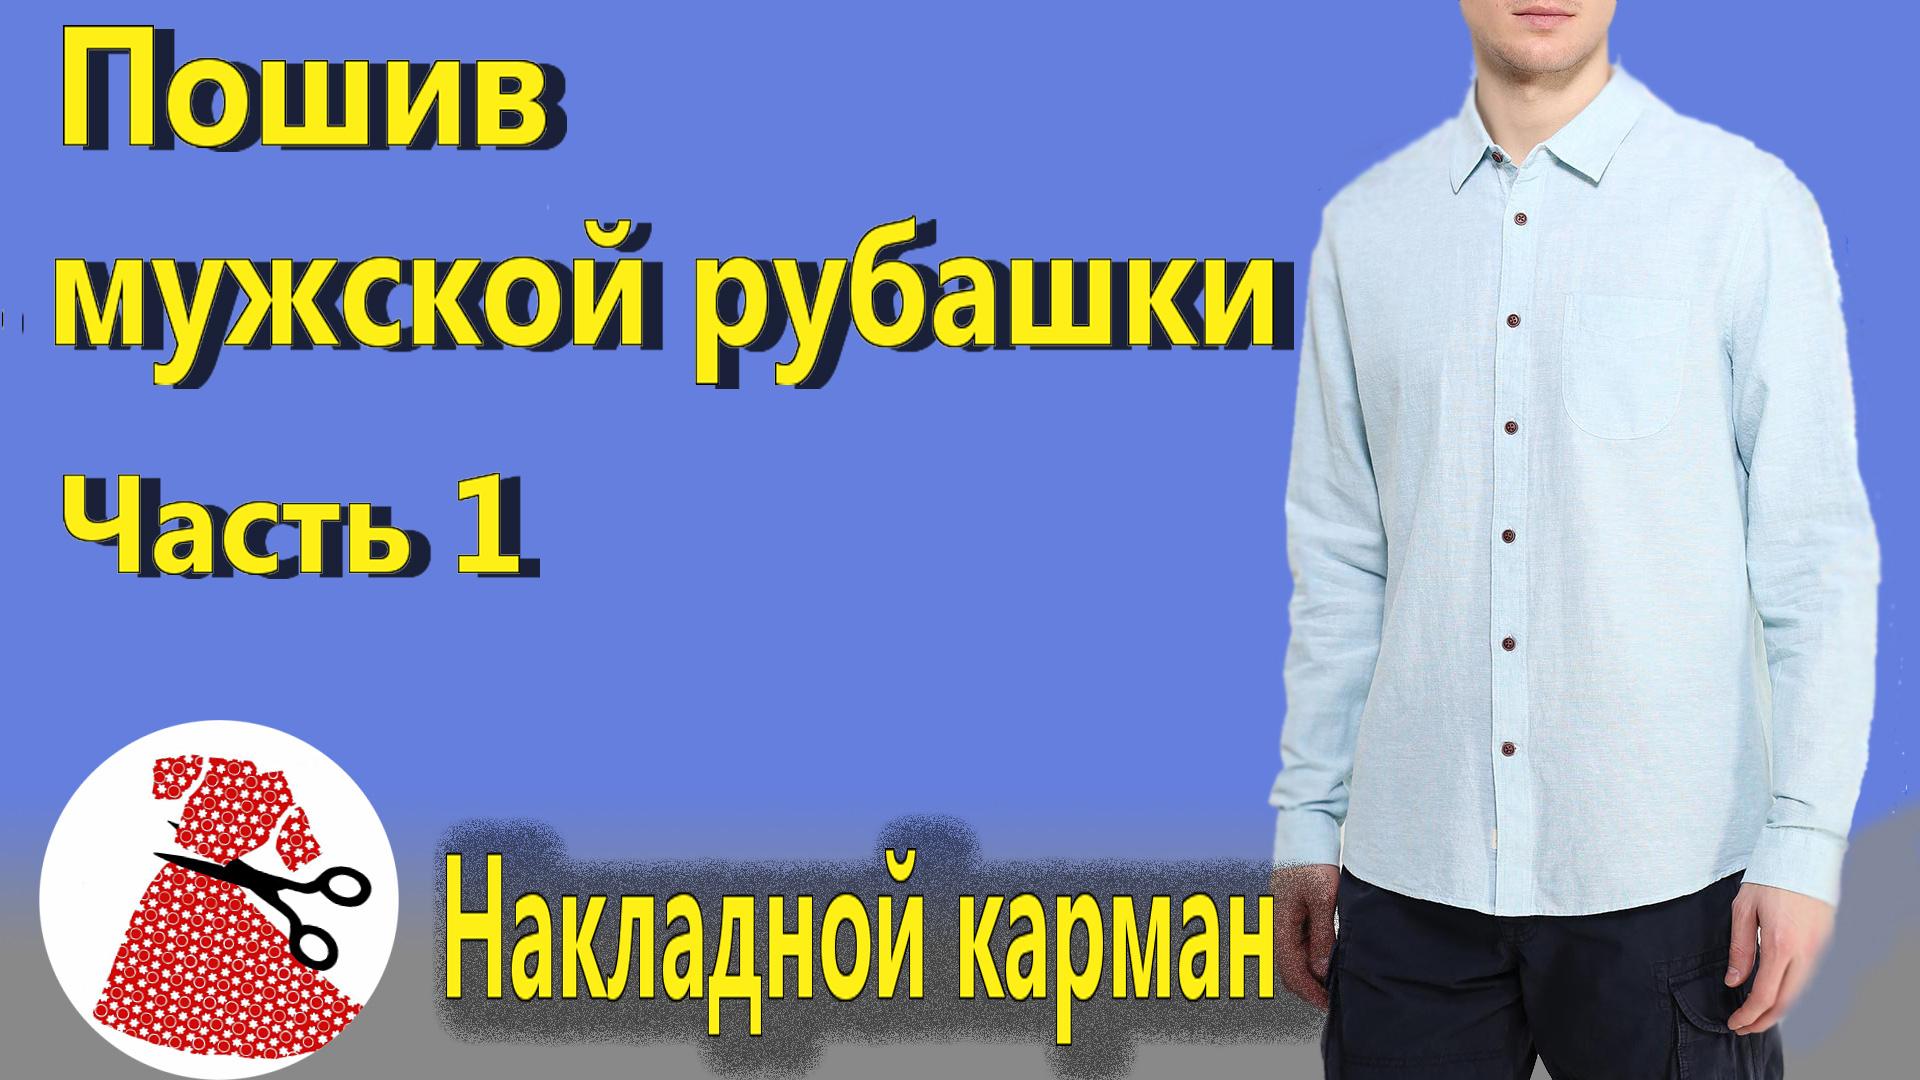 poshiv-muzhskoj-rubashki-chast-1_nakladnoj-karman